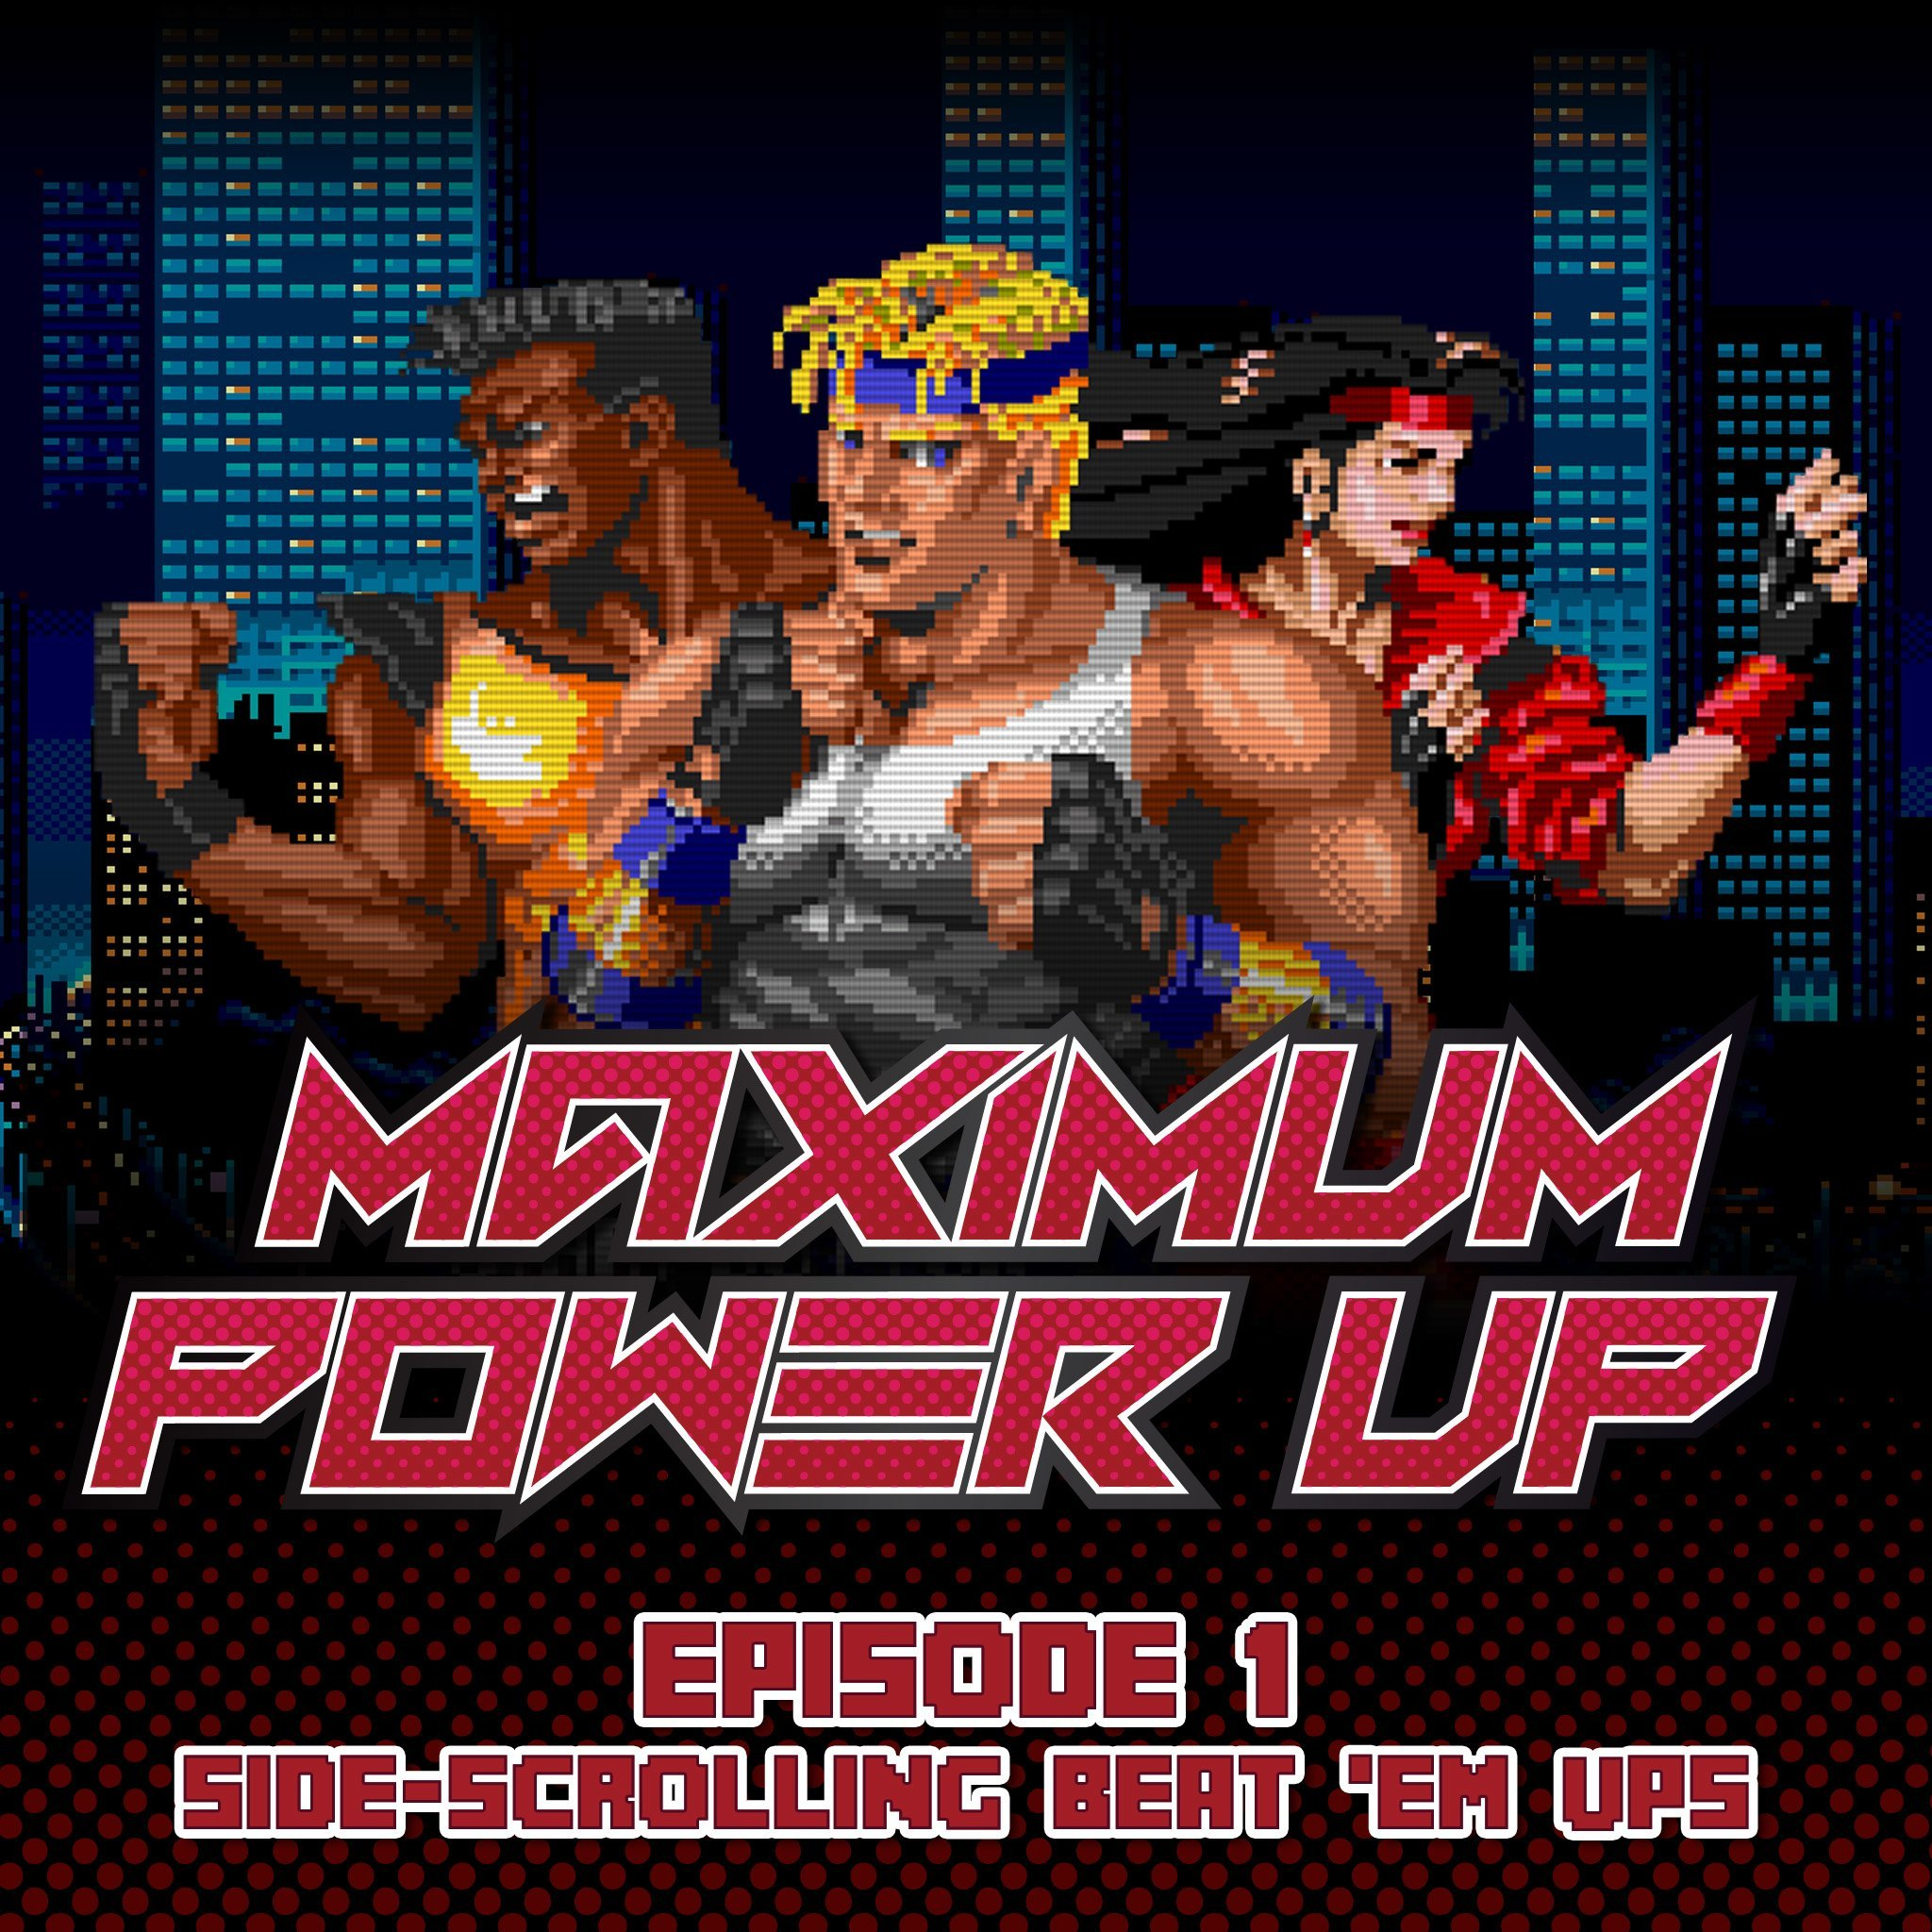 MPU_Ep1_Side_Scrollin_Beat_Em_Ups_2048x2048